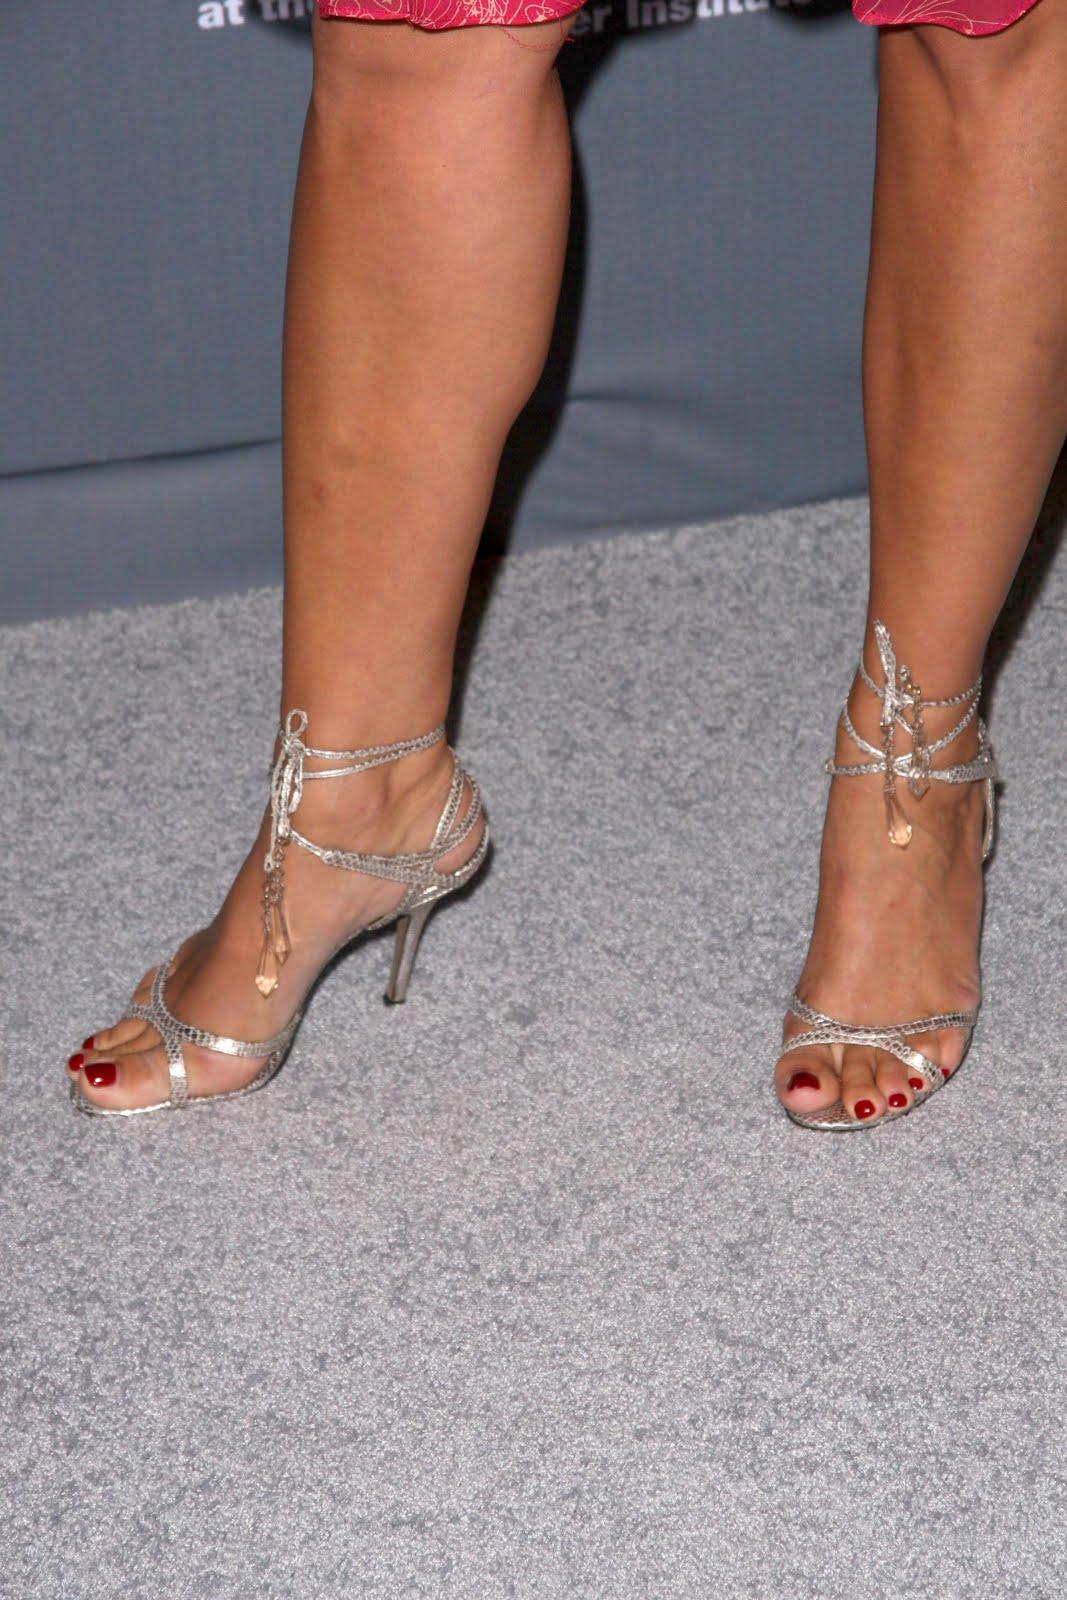 http://3.bp.blogspot.com/_UaLWp72nij4/TBfoT5OK07I/AAAAAAAAPGc/1v8g8FKnll4/s1600/natasha-henstridge-feet-4.jpg